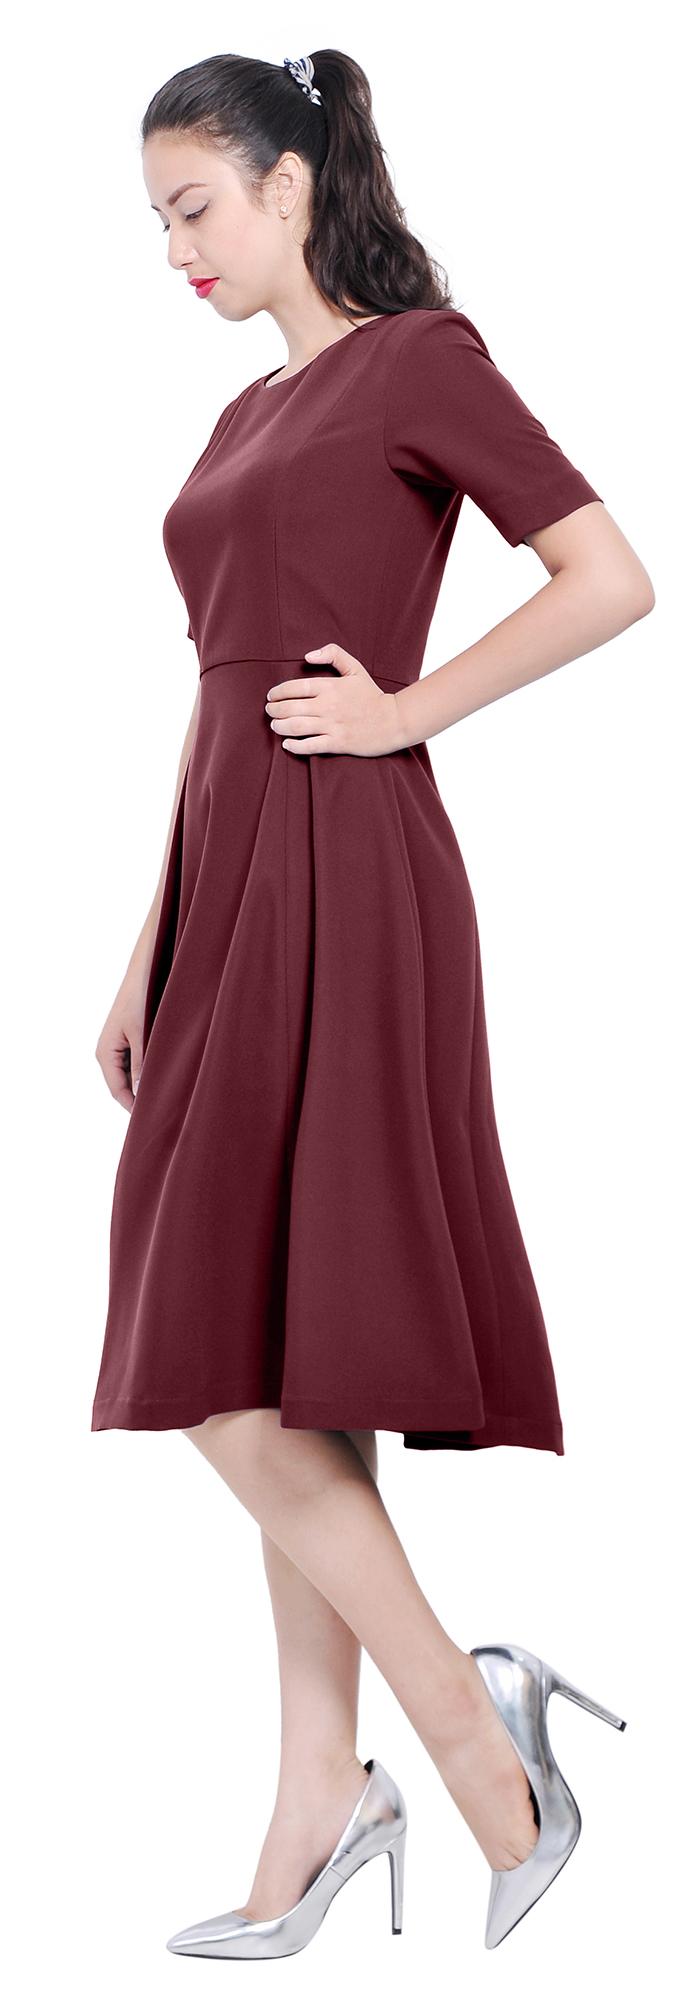 Designer Dresses by Faviana New York | Faviana